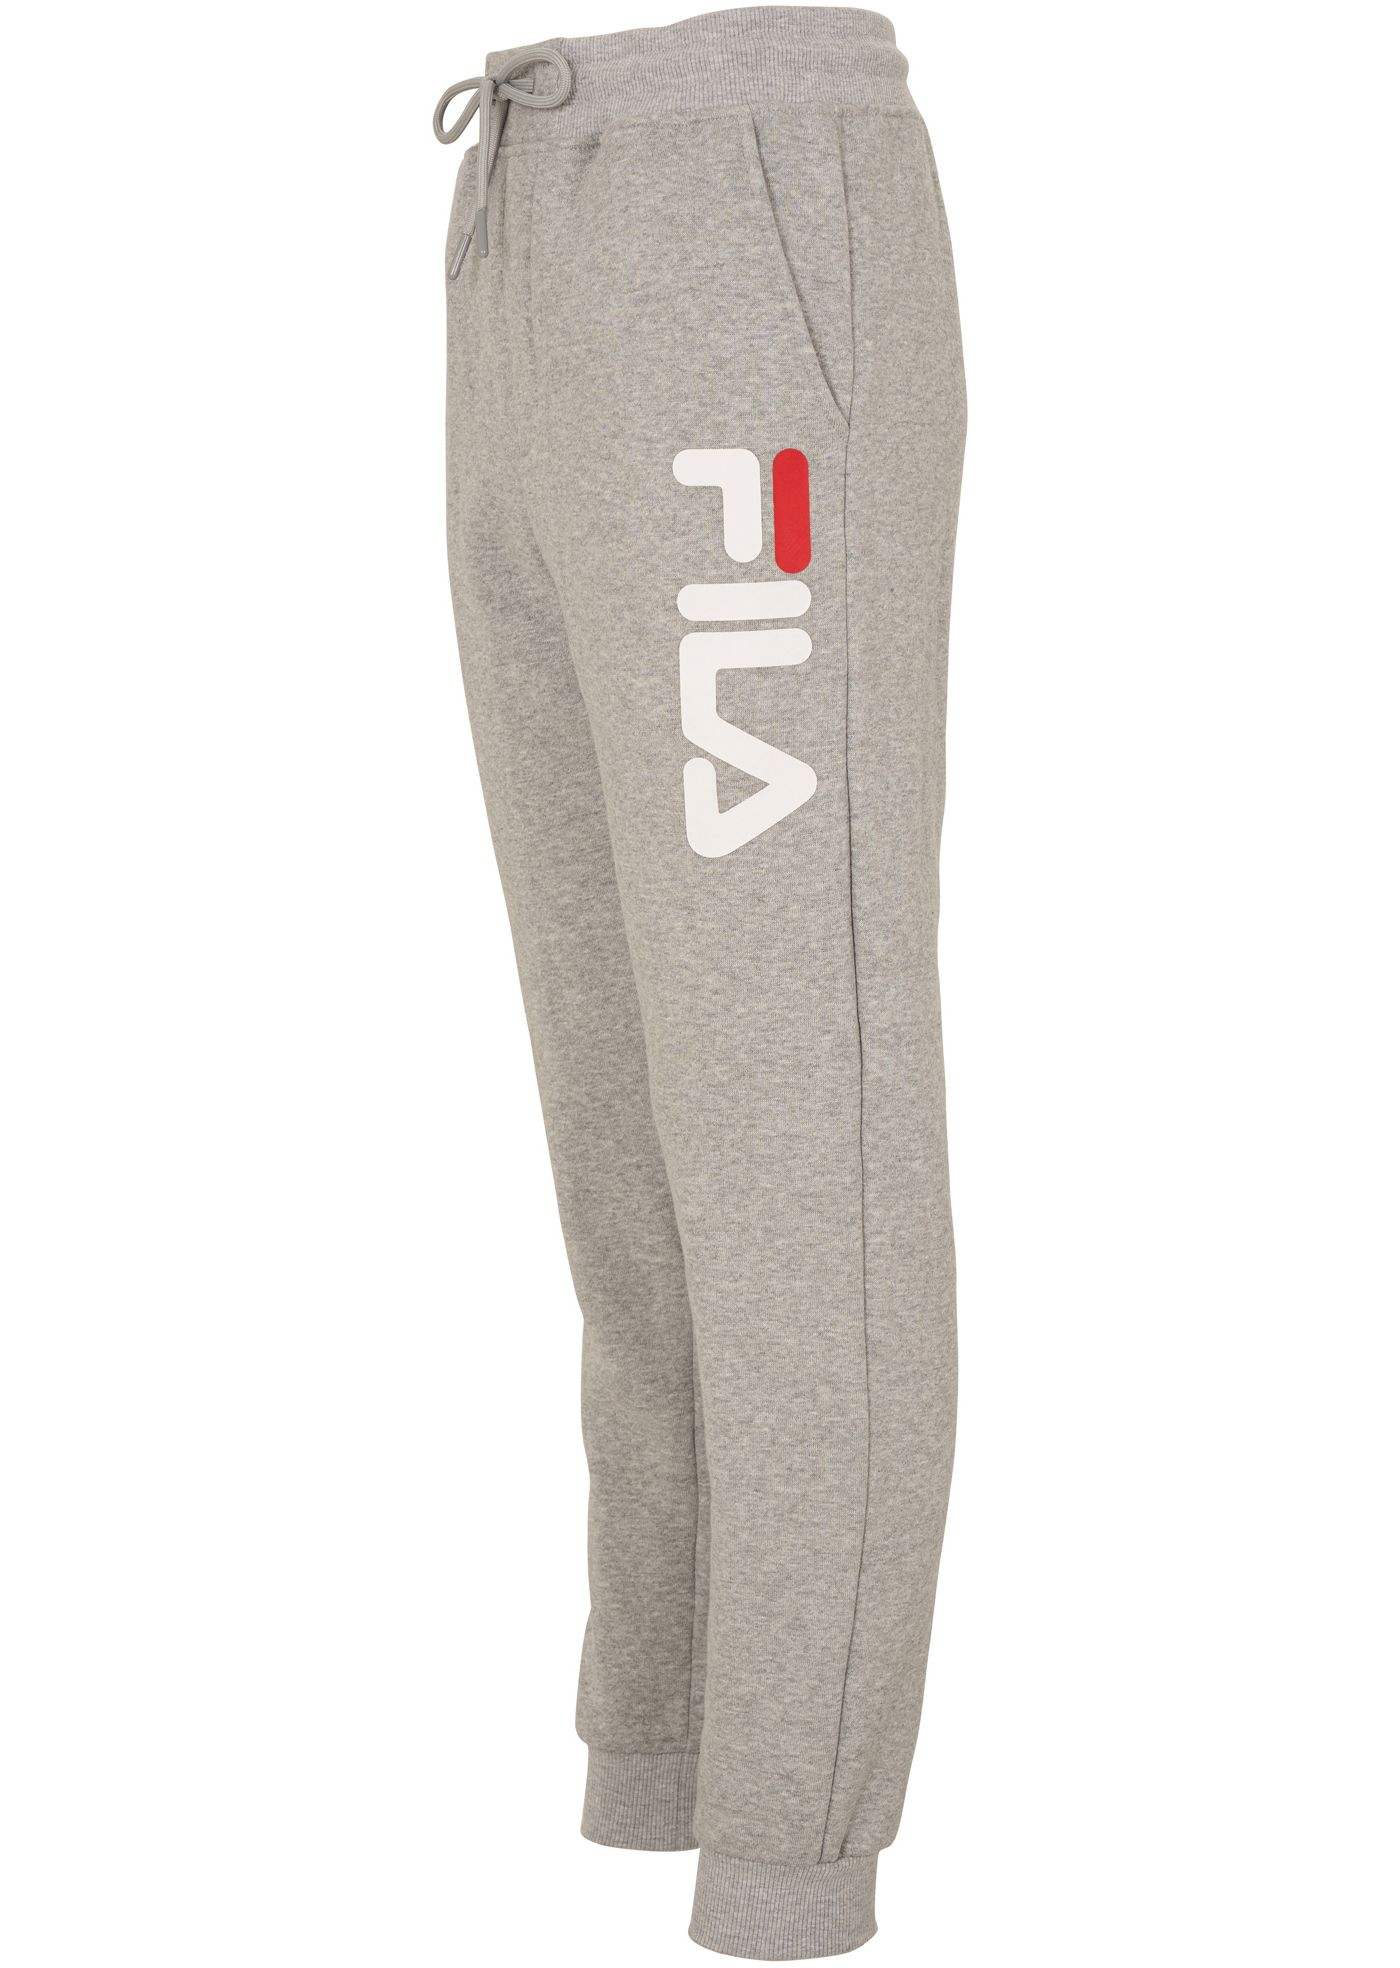 FILA Boy's Classic Jogger Pants